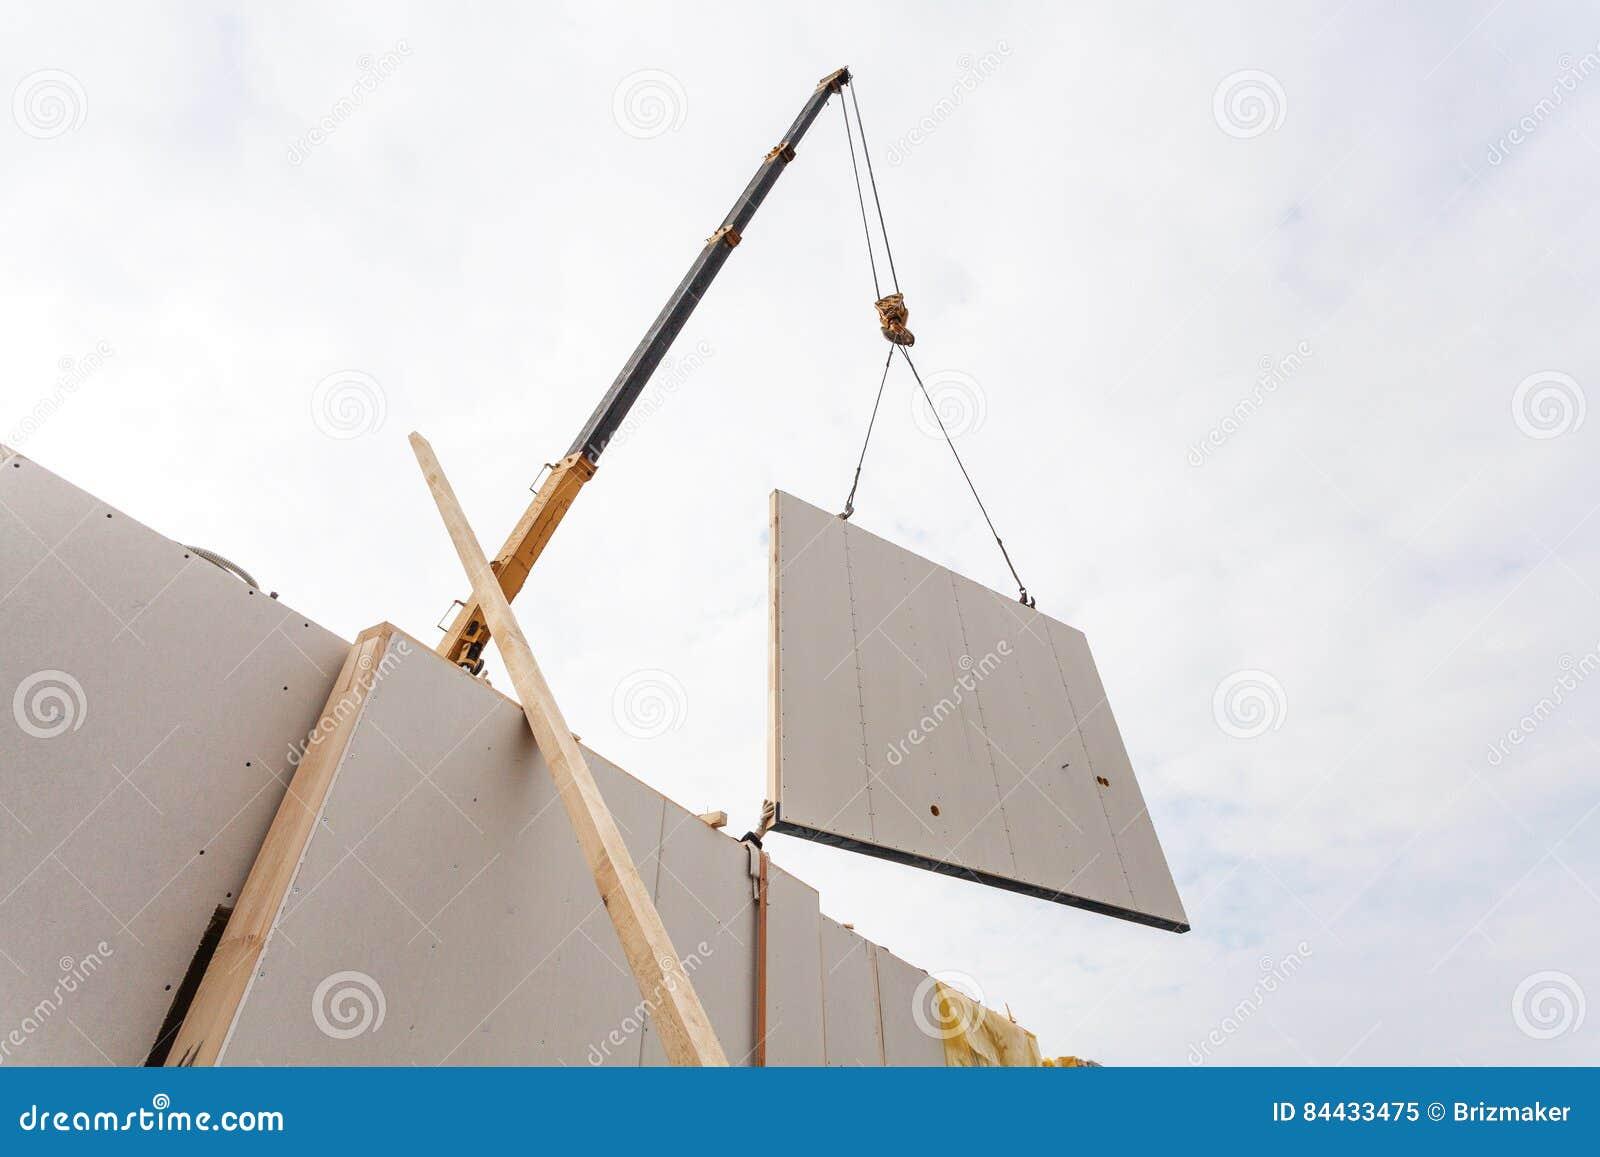 Construcción Económica De Energía Stock Photos - 144 Images